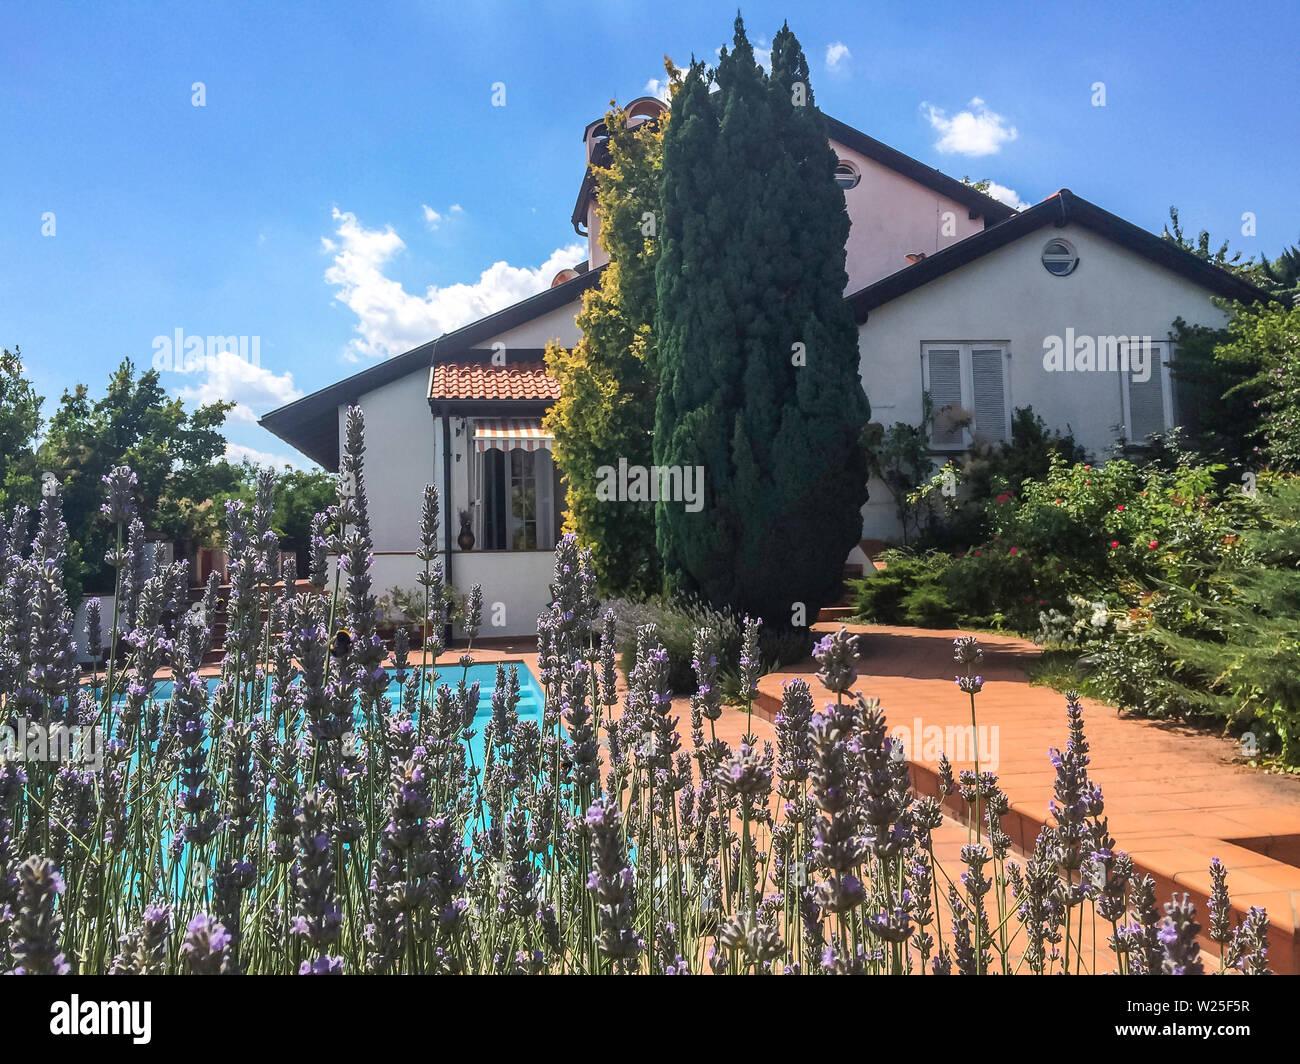 Provence House Lavande Garden Swimming Pool House For Sale Juille 05 2019 Budapest Buda 1025 Hungary Vl18 Biphoto Studio Stock Photo Alamy